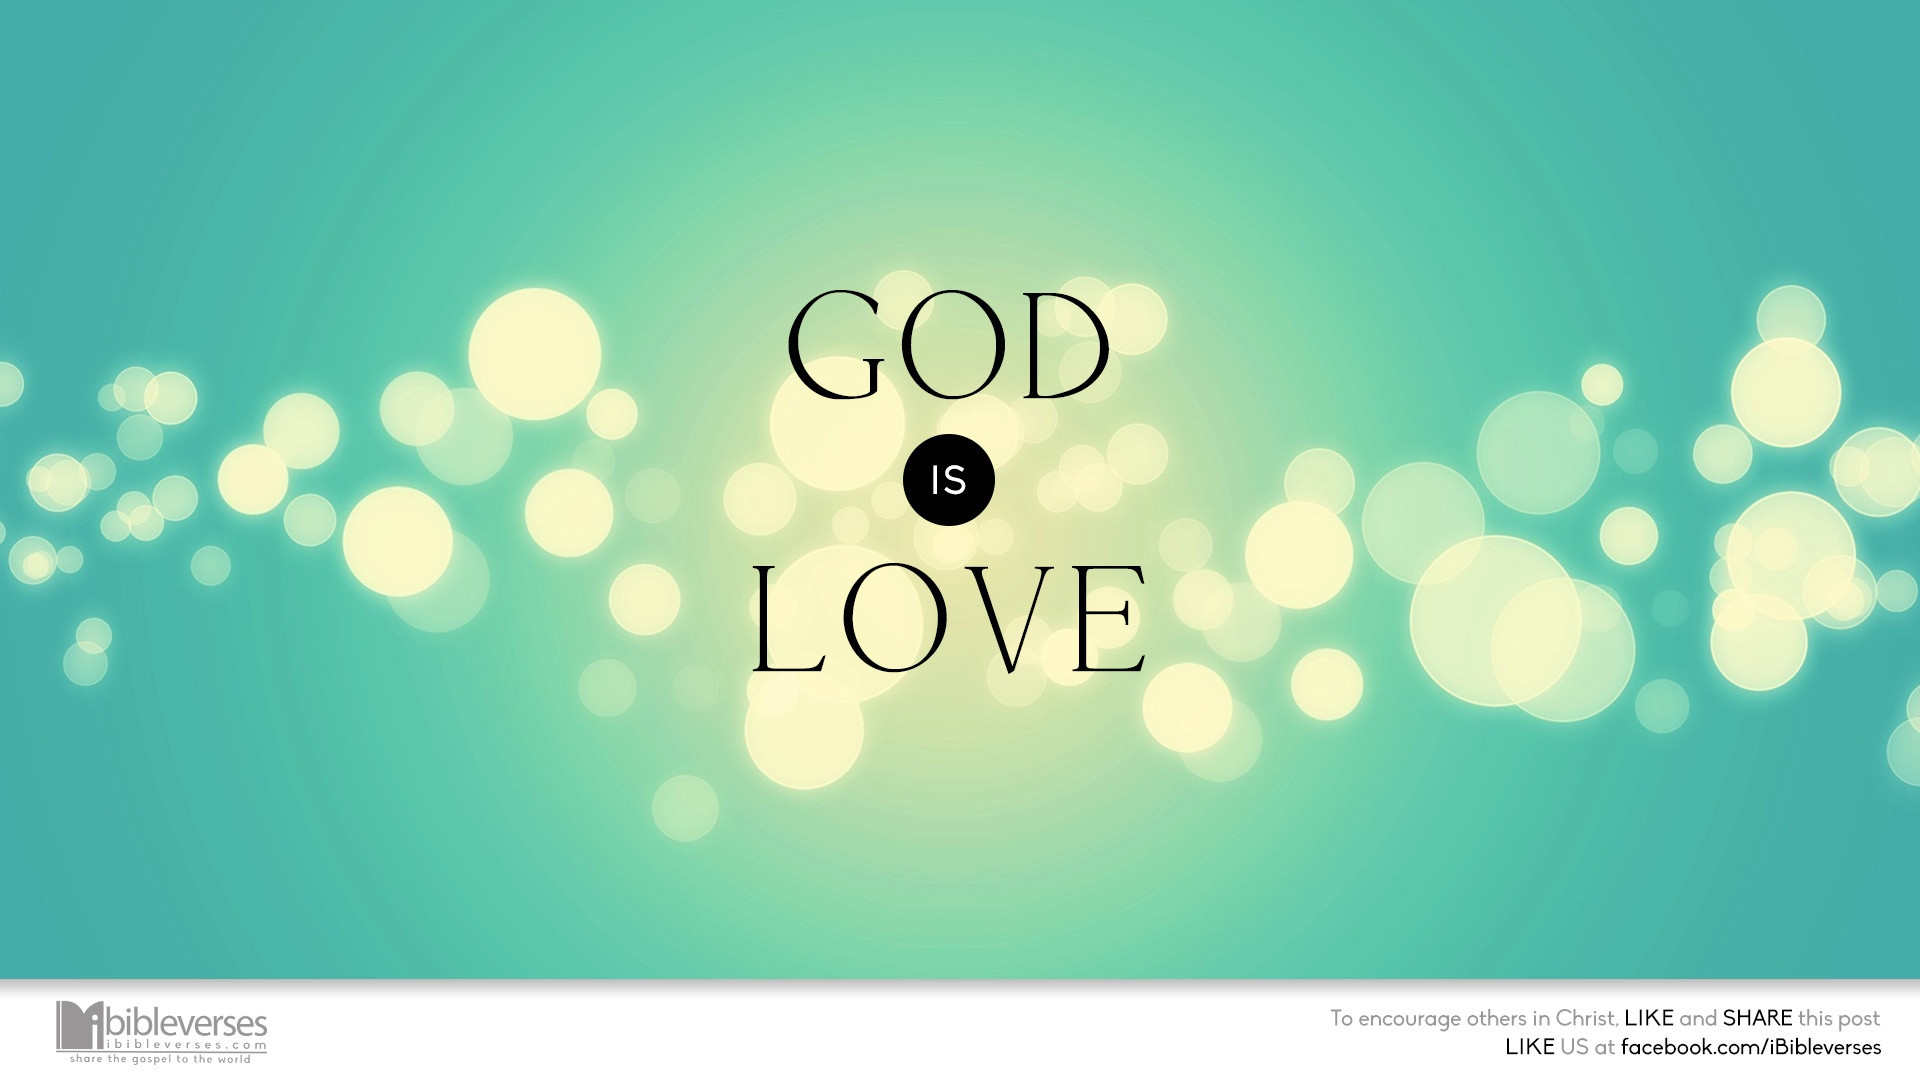 2560x1440 Wallpapers Hd Bible Quotes God Is Love Desktop Wallpaper 54 Images